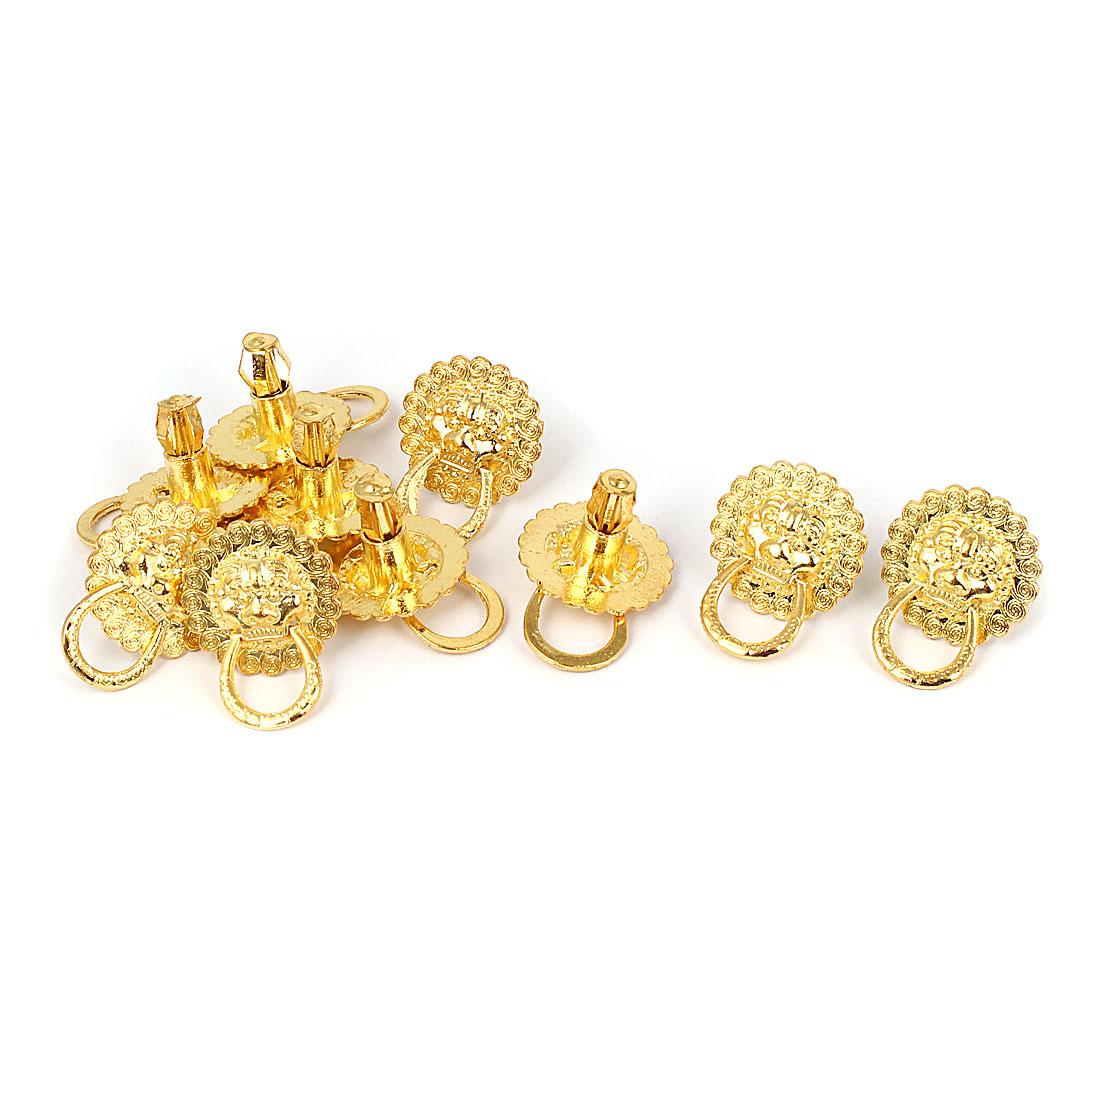 Jewellery Box Showcase Lion Head Design Pull Handle Ring Knob 10pcs